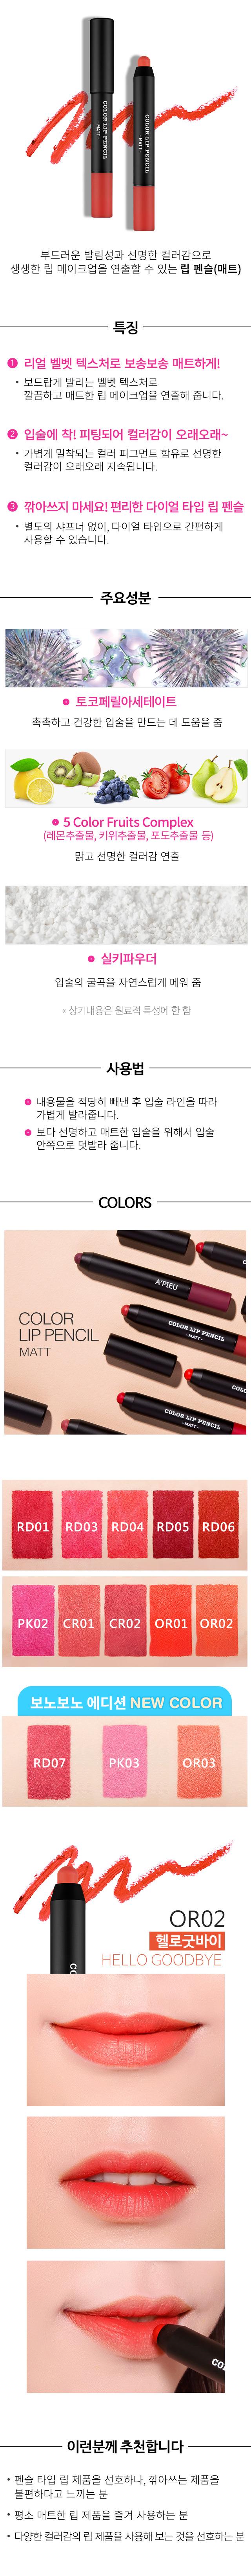 APIEU_Color_Lip_Pencil_Matt_OR02_07.jpg